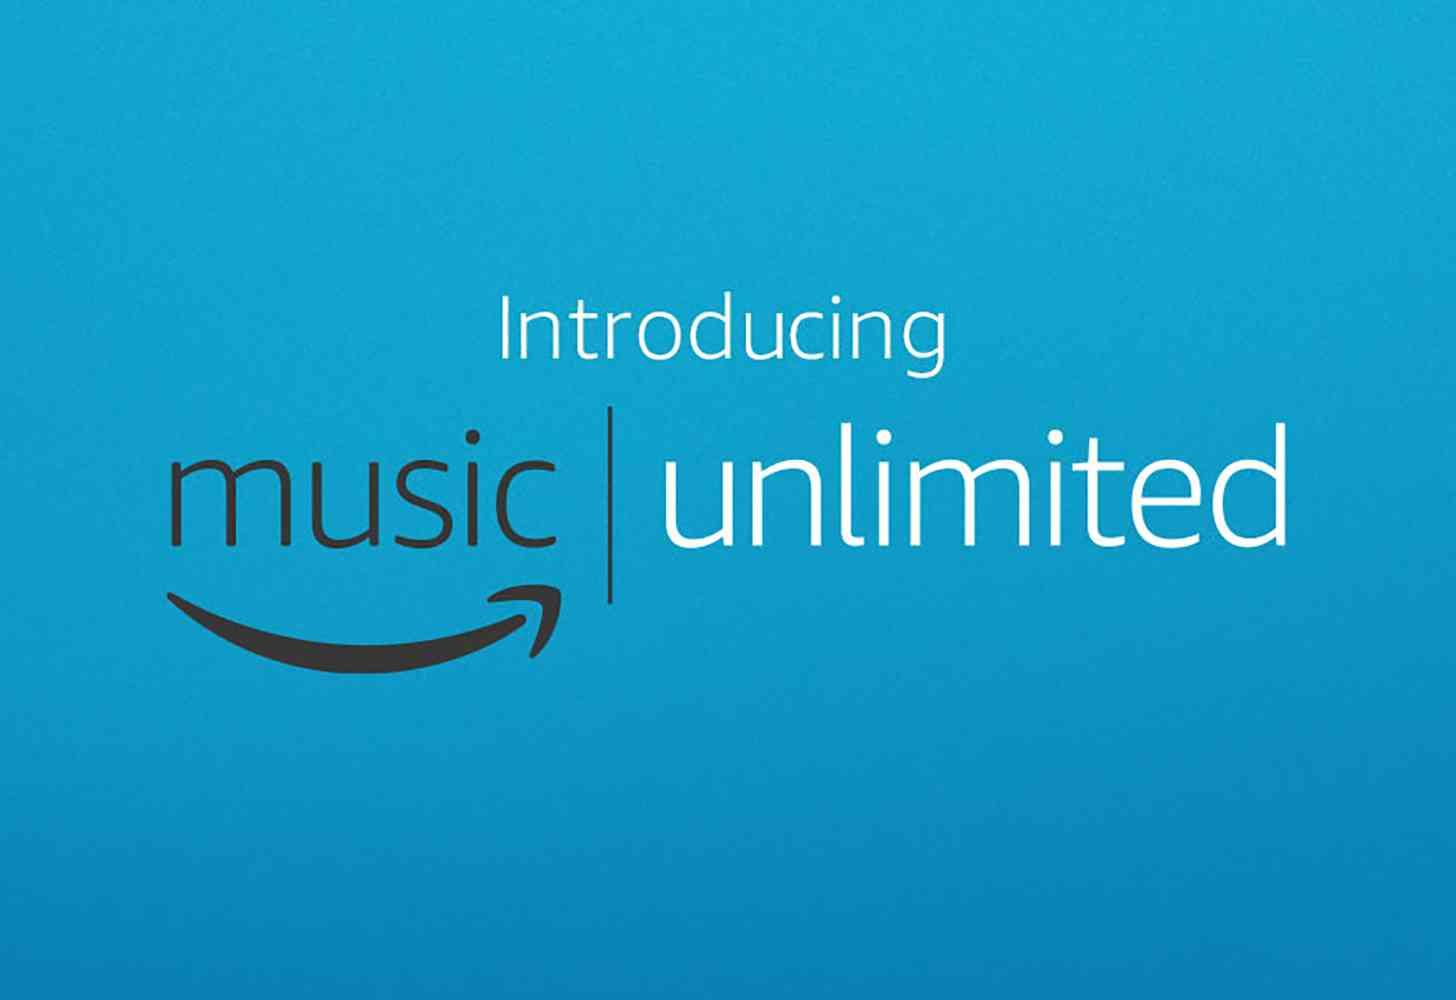 Amazon запускает стриминговый сервис Amazon Music Unlimited